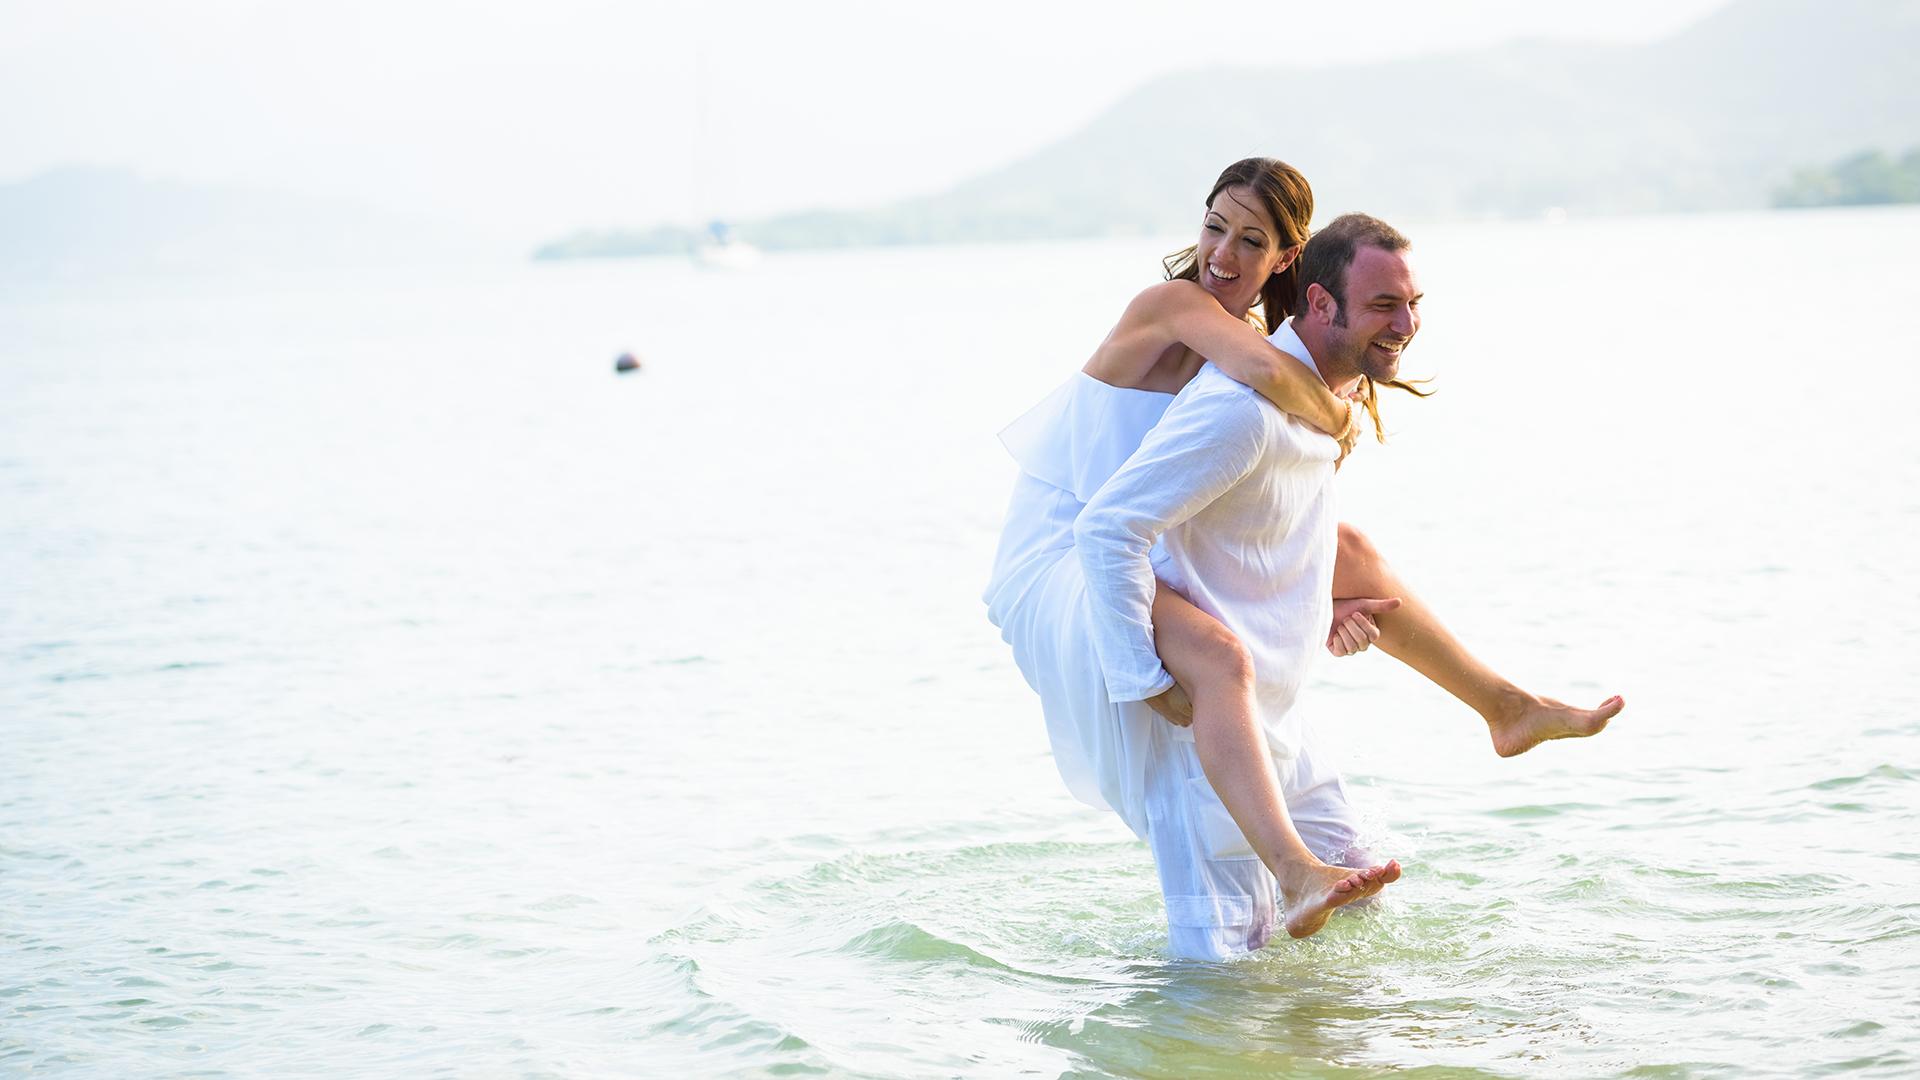 An intimate destination wedding at Kualoa Ranch Secret Island, Hawaii.